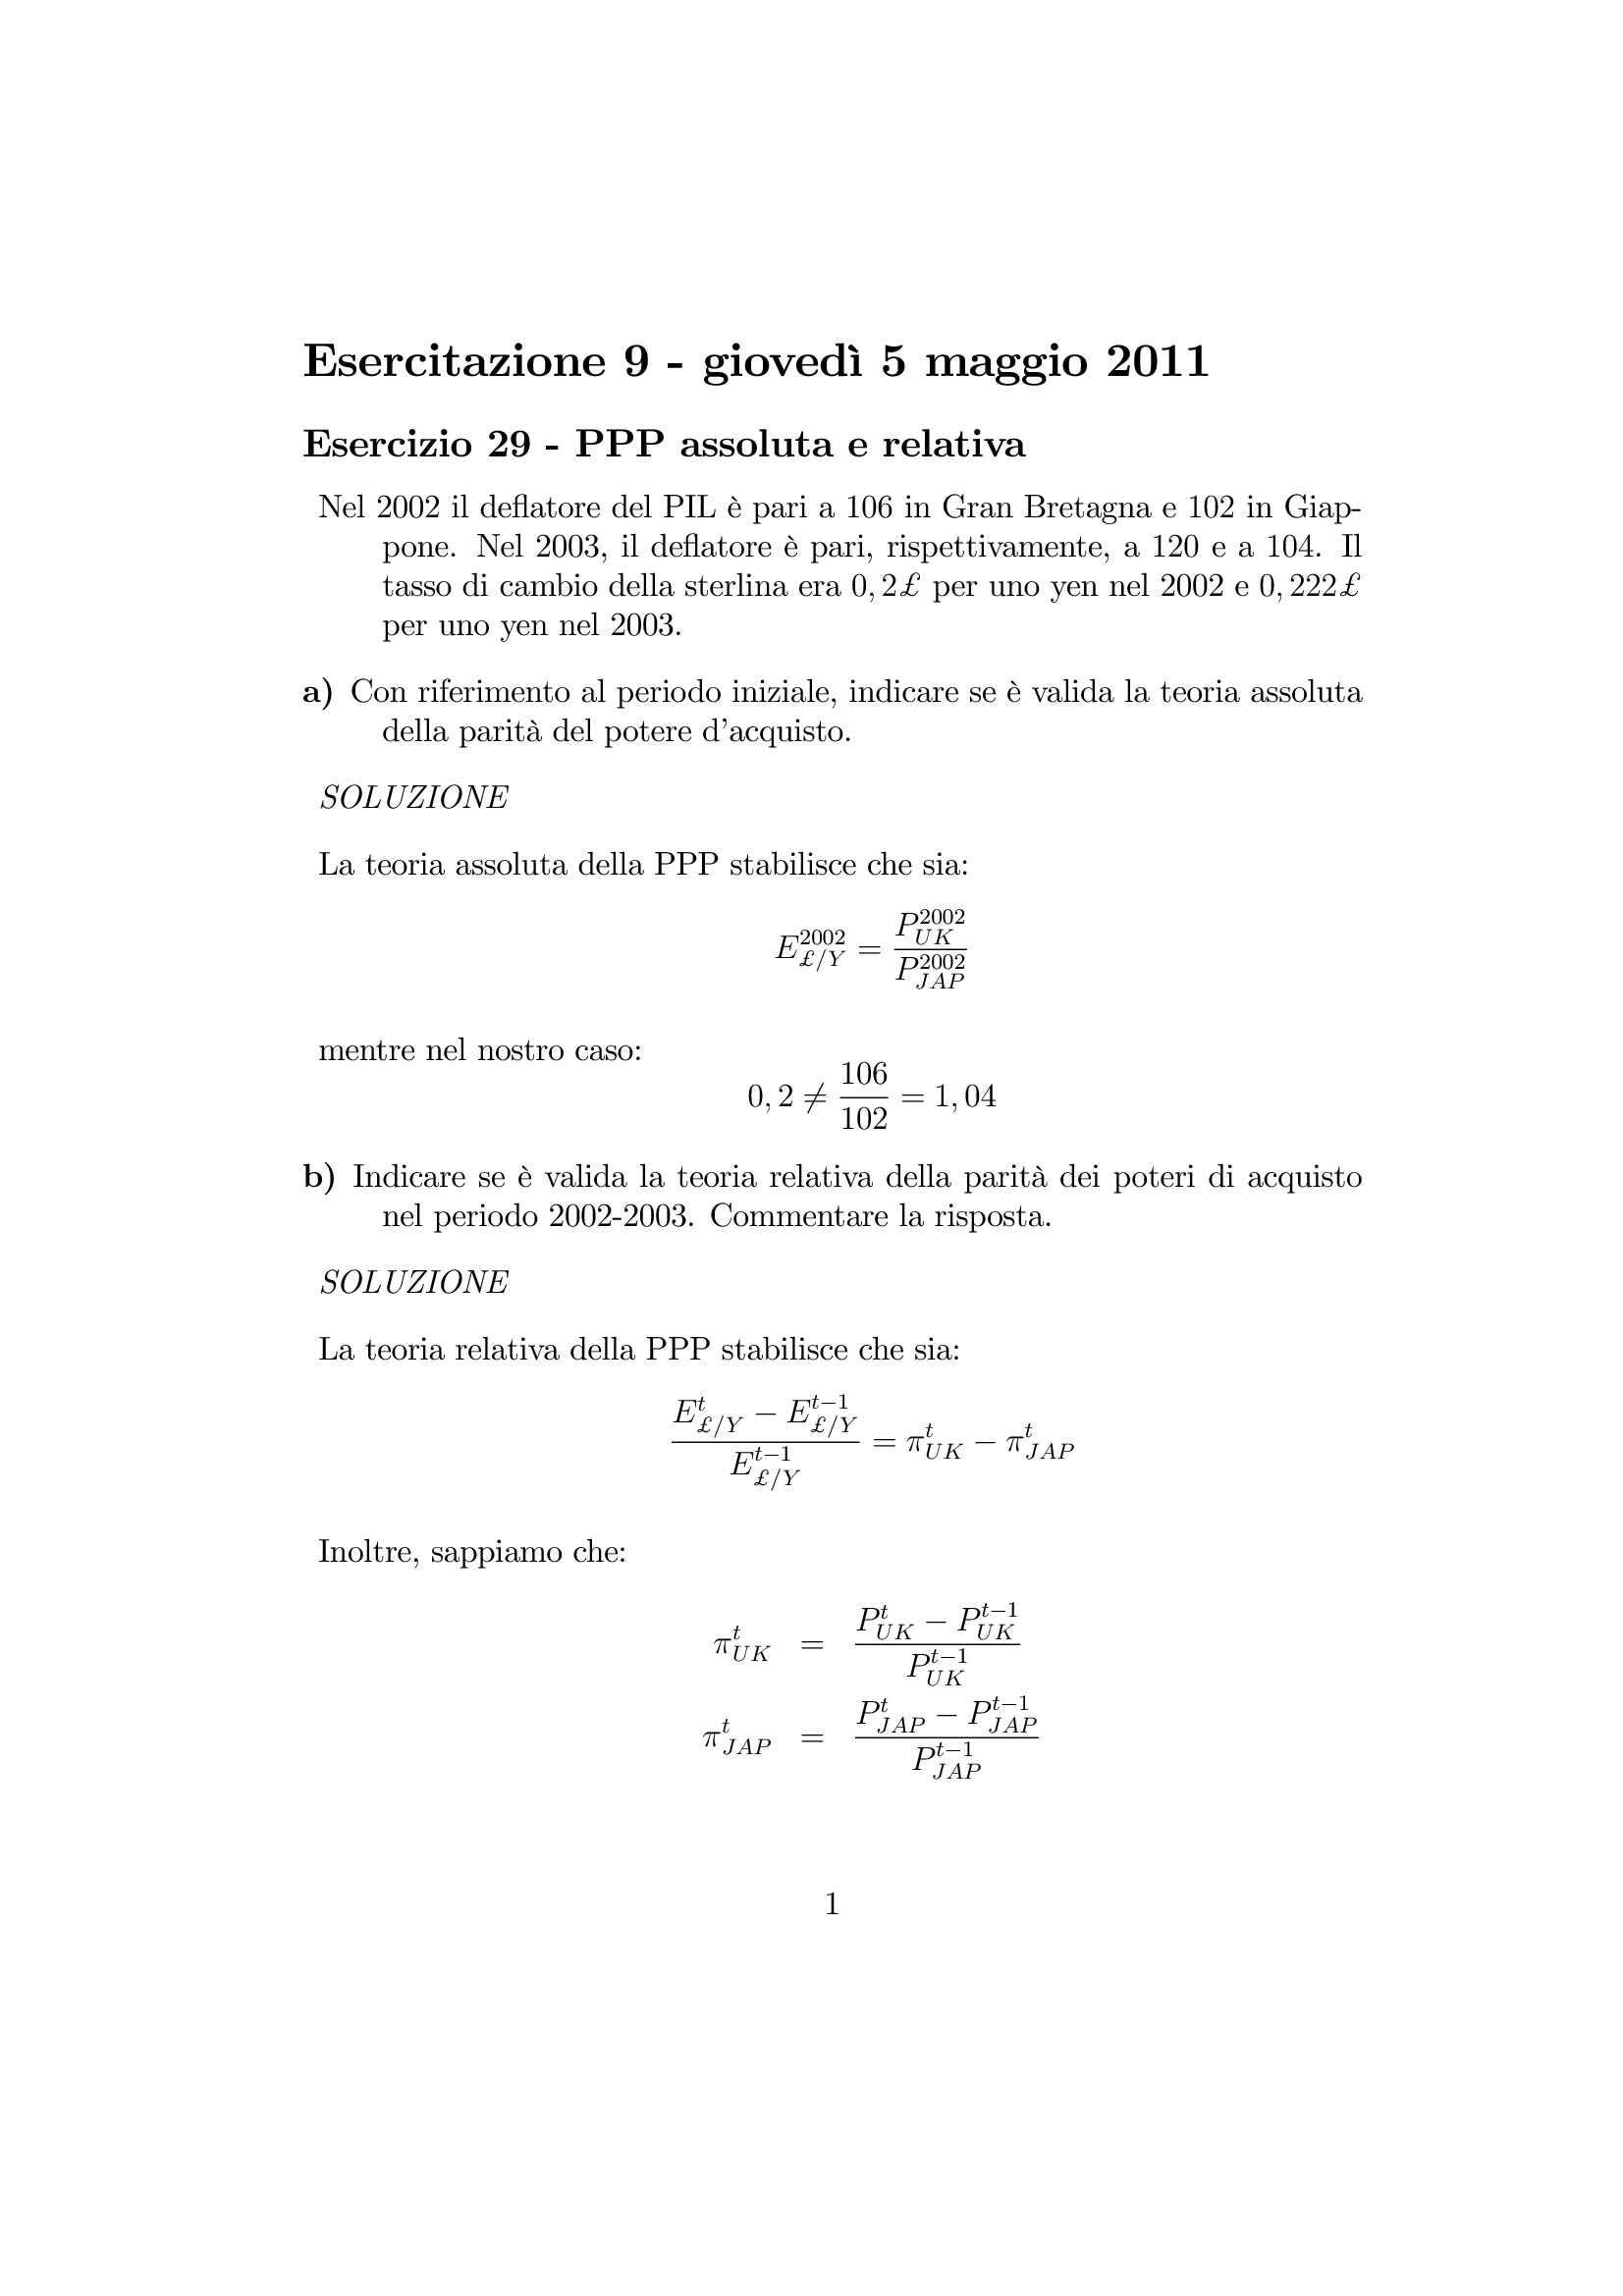 PPP assoluta e relativa